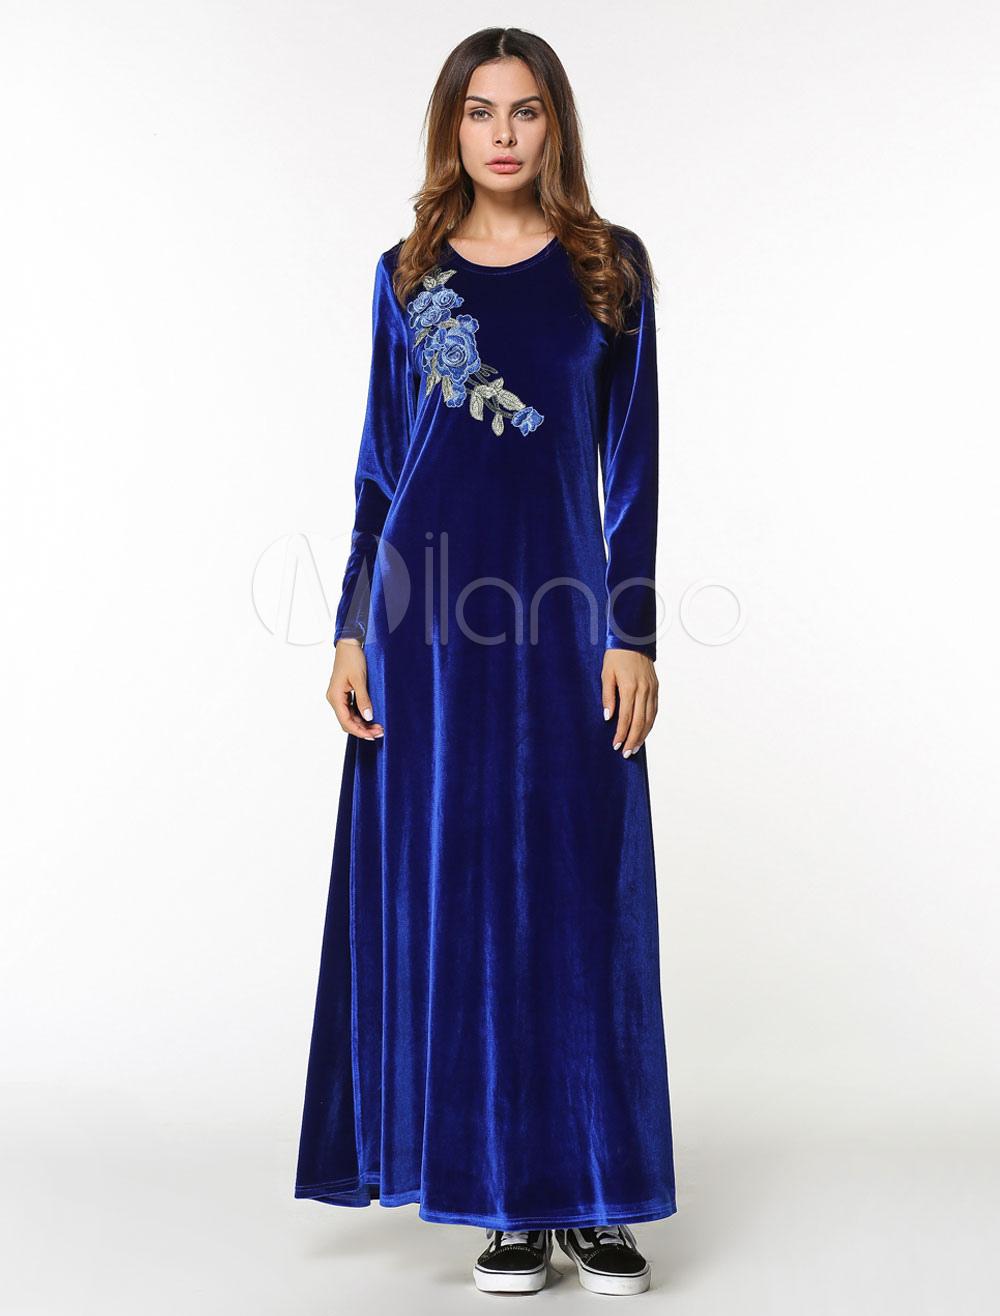 blau floral velvet kleid